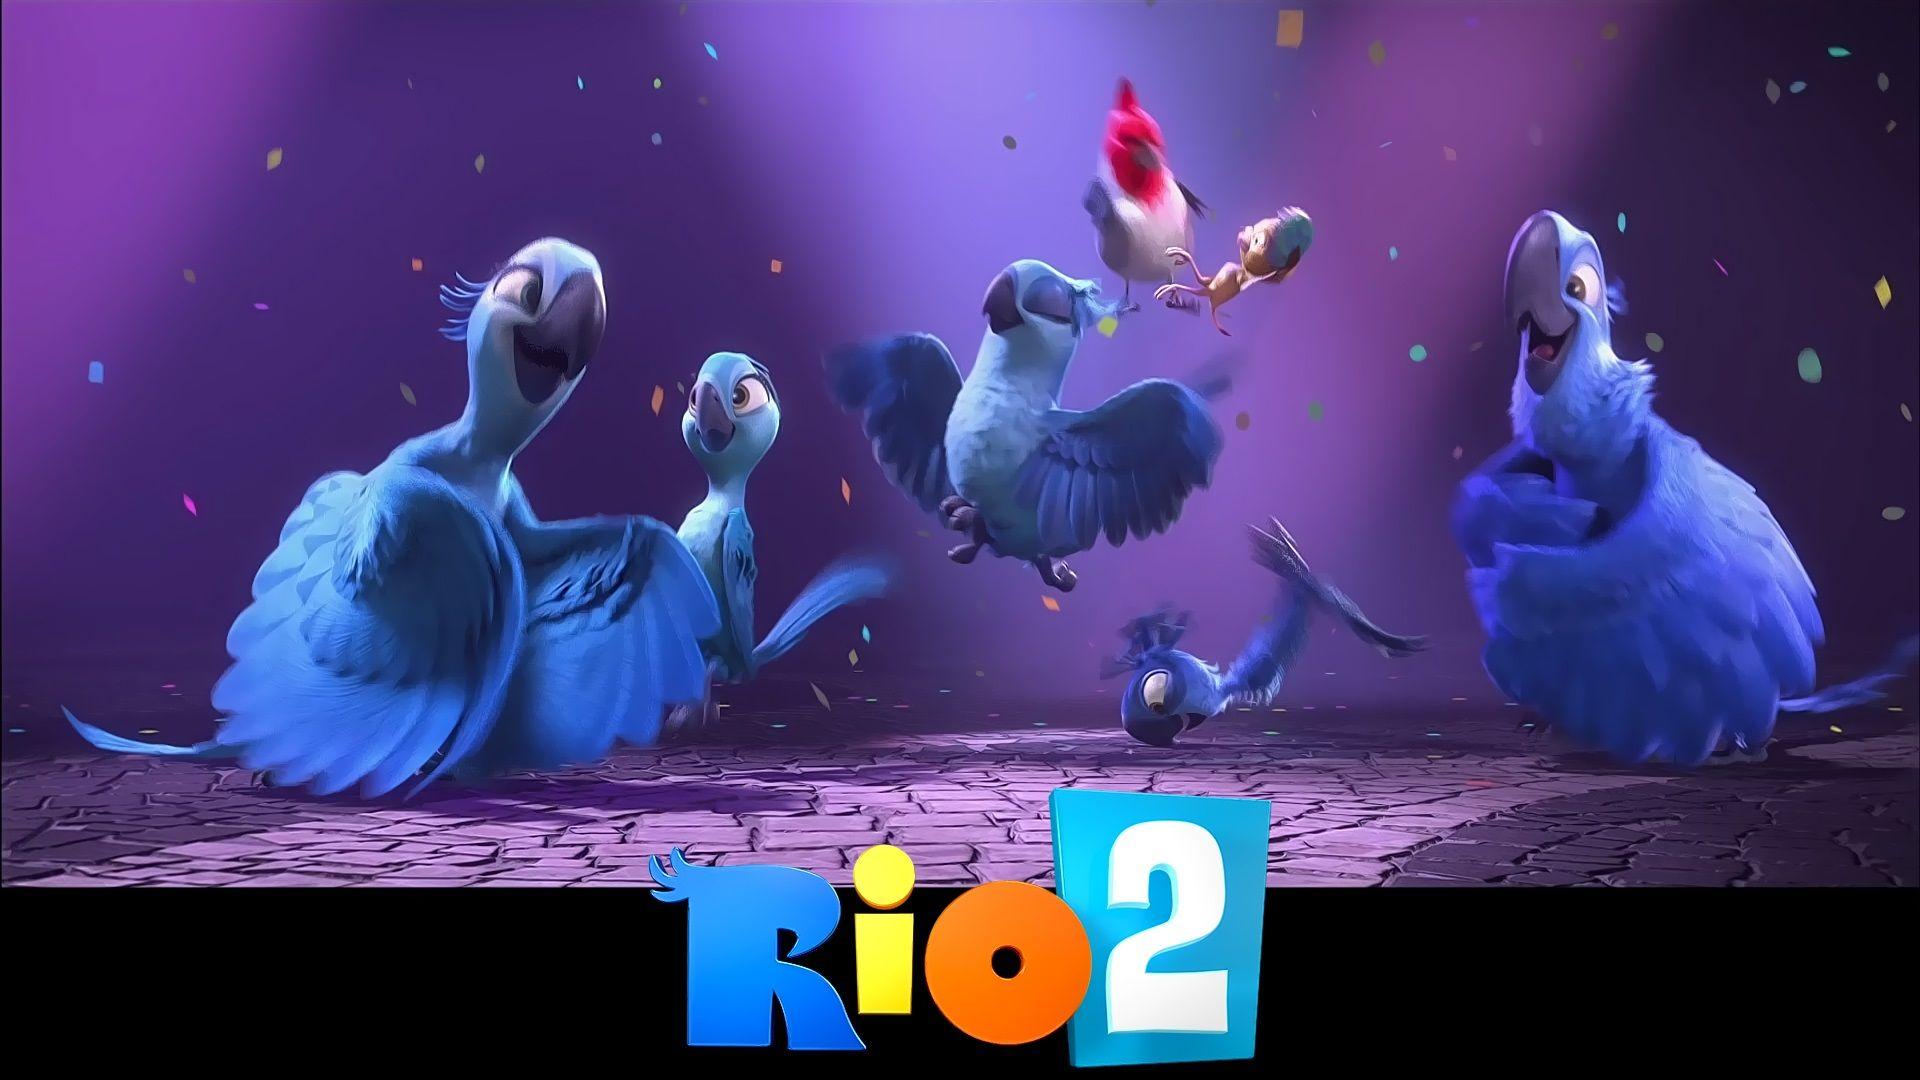 Rio 2 desktop wallpapers general pinterest rio 2 desktop wallpapers voltagebd Choice Image